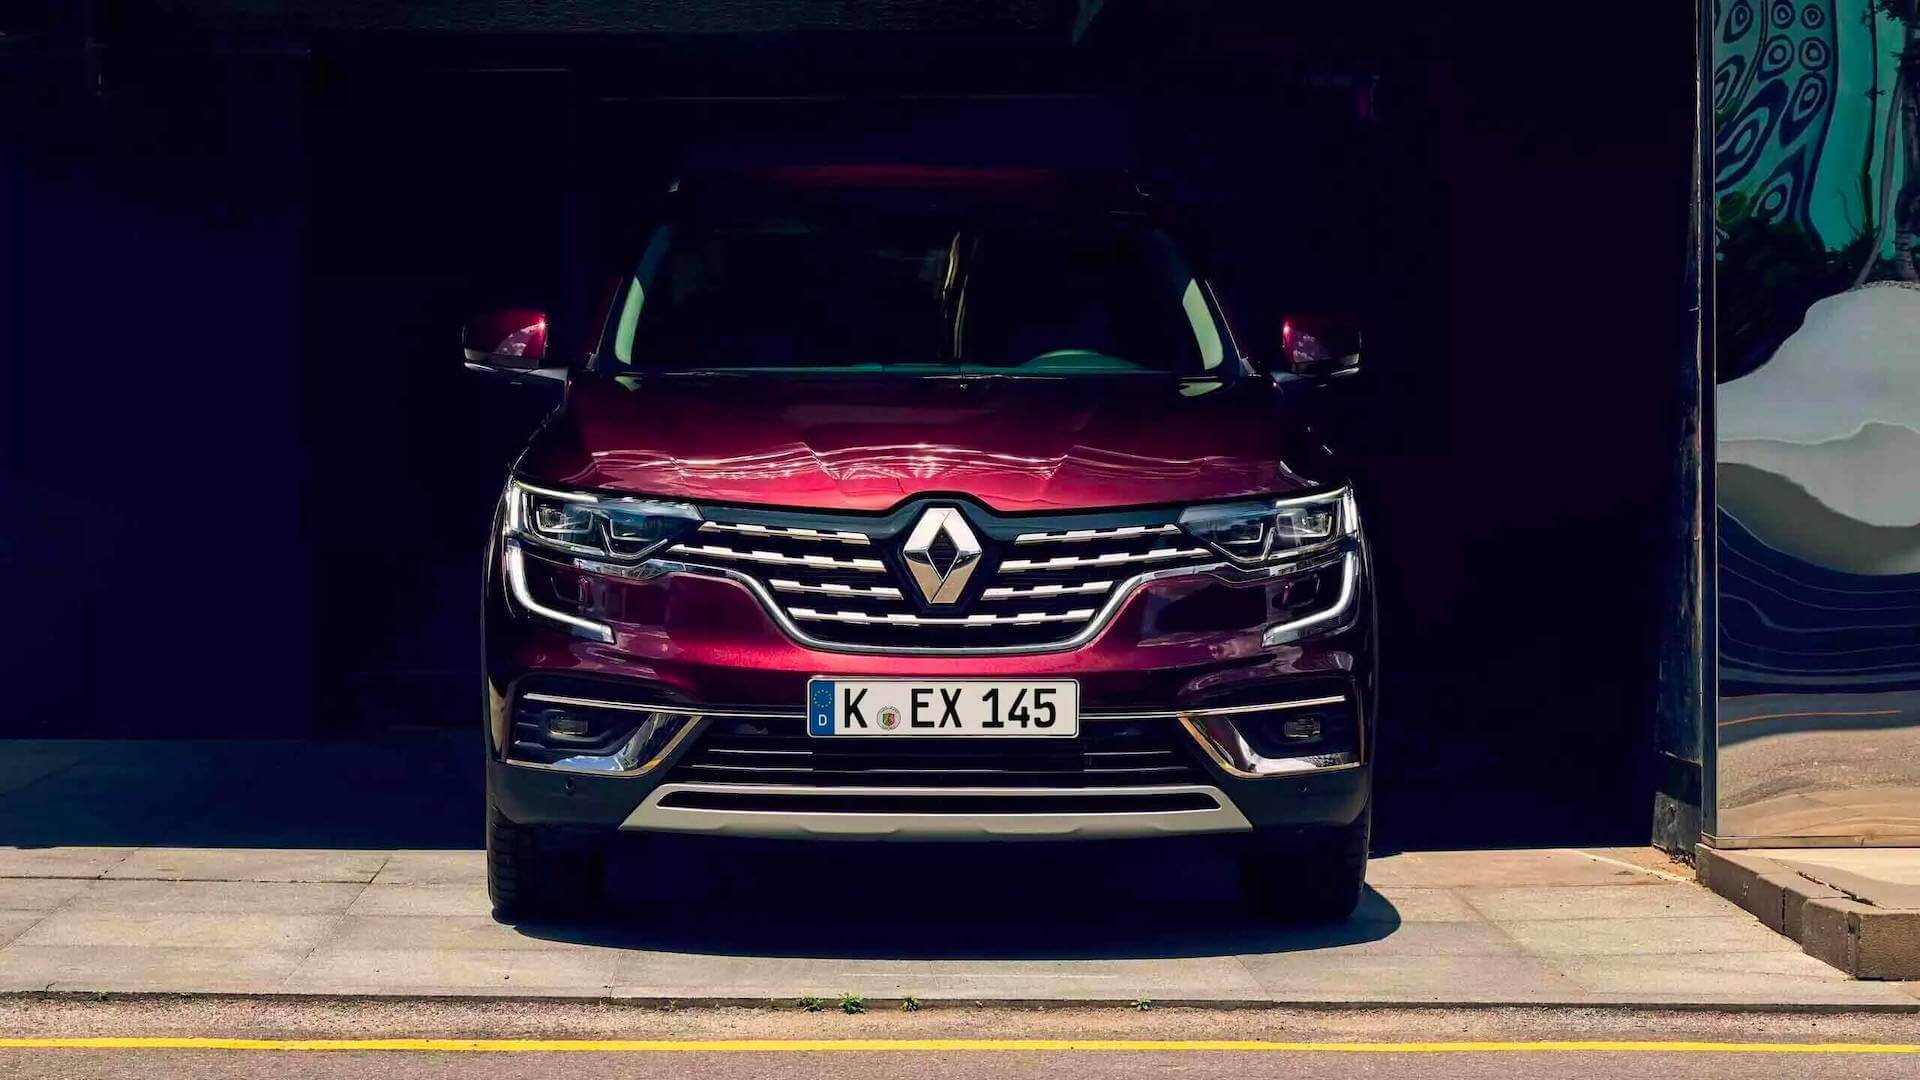 Frontansicht vom roten Auto - Renault Koleos - Renault Ahrens Hannover